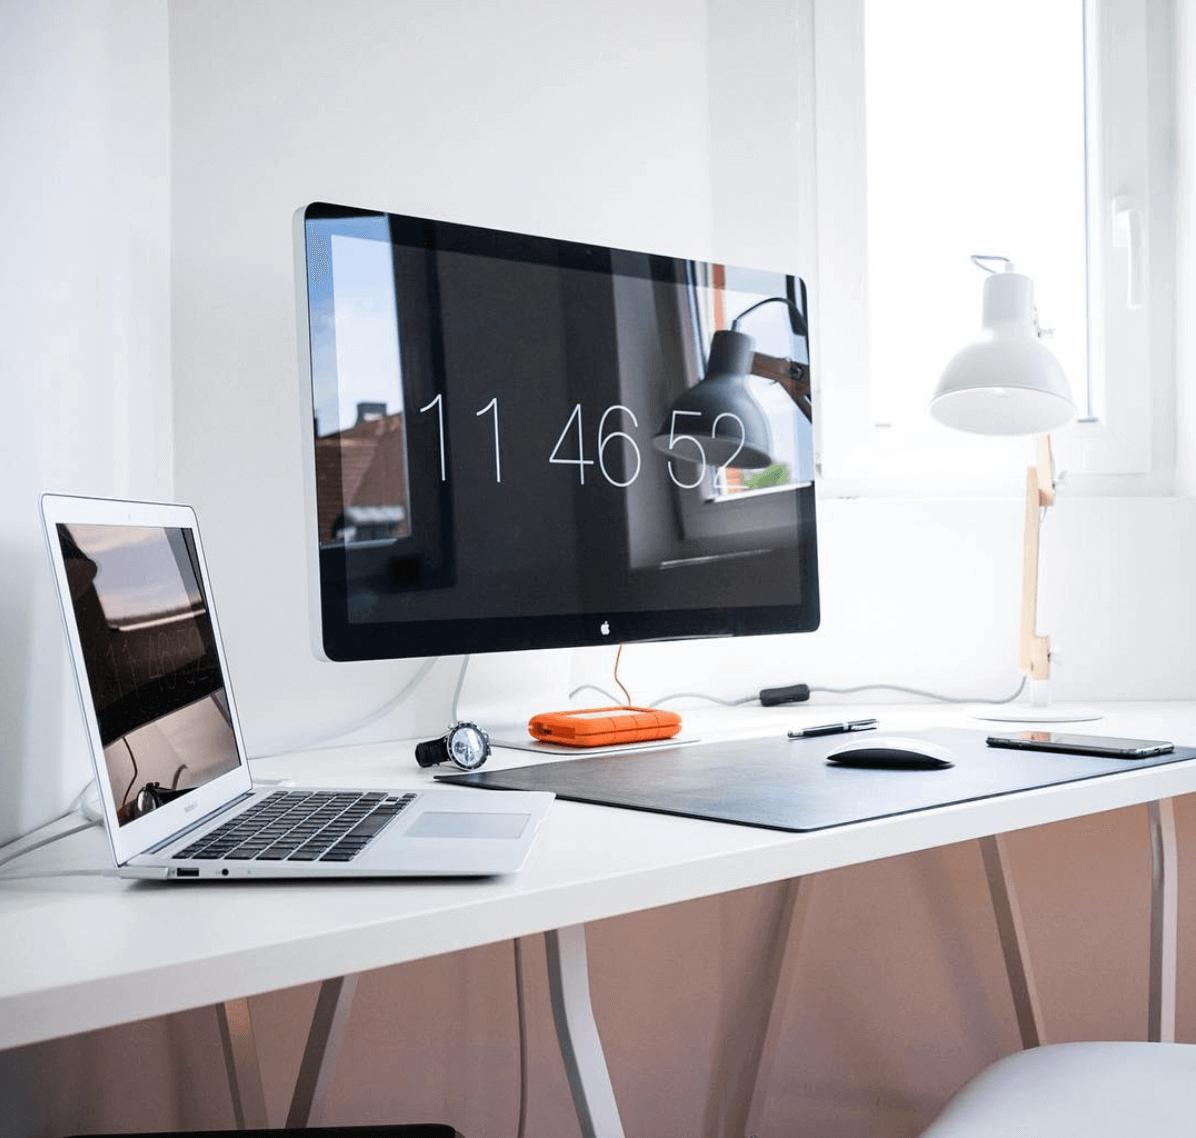 Minimalist Setup For Desk By Pierre